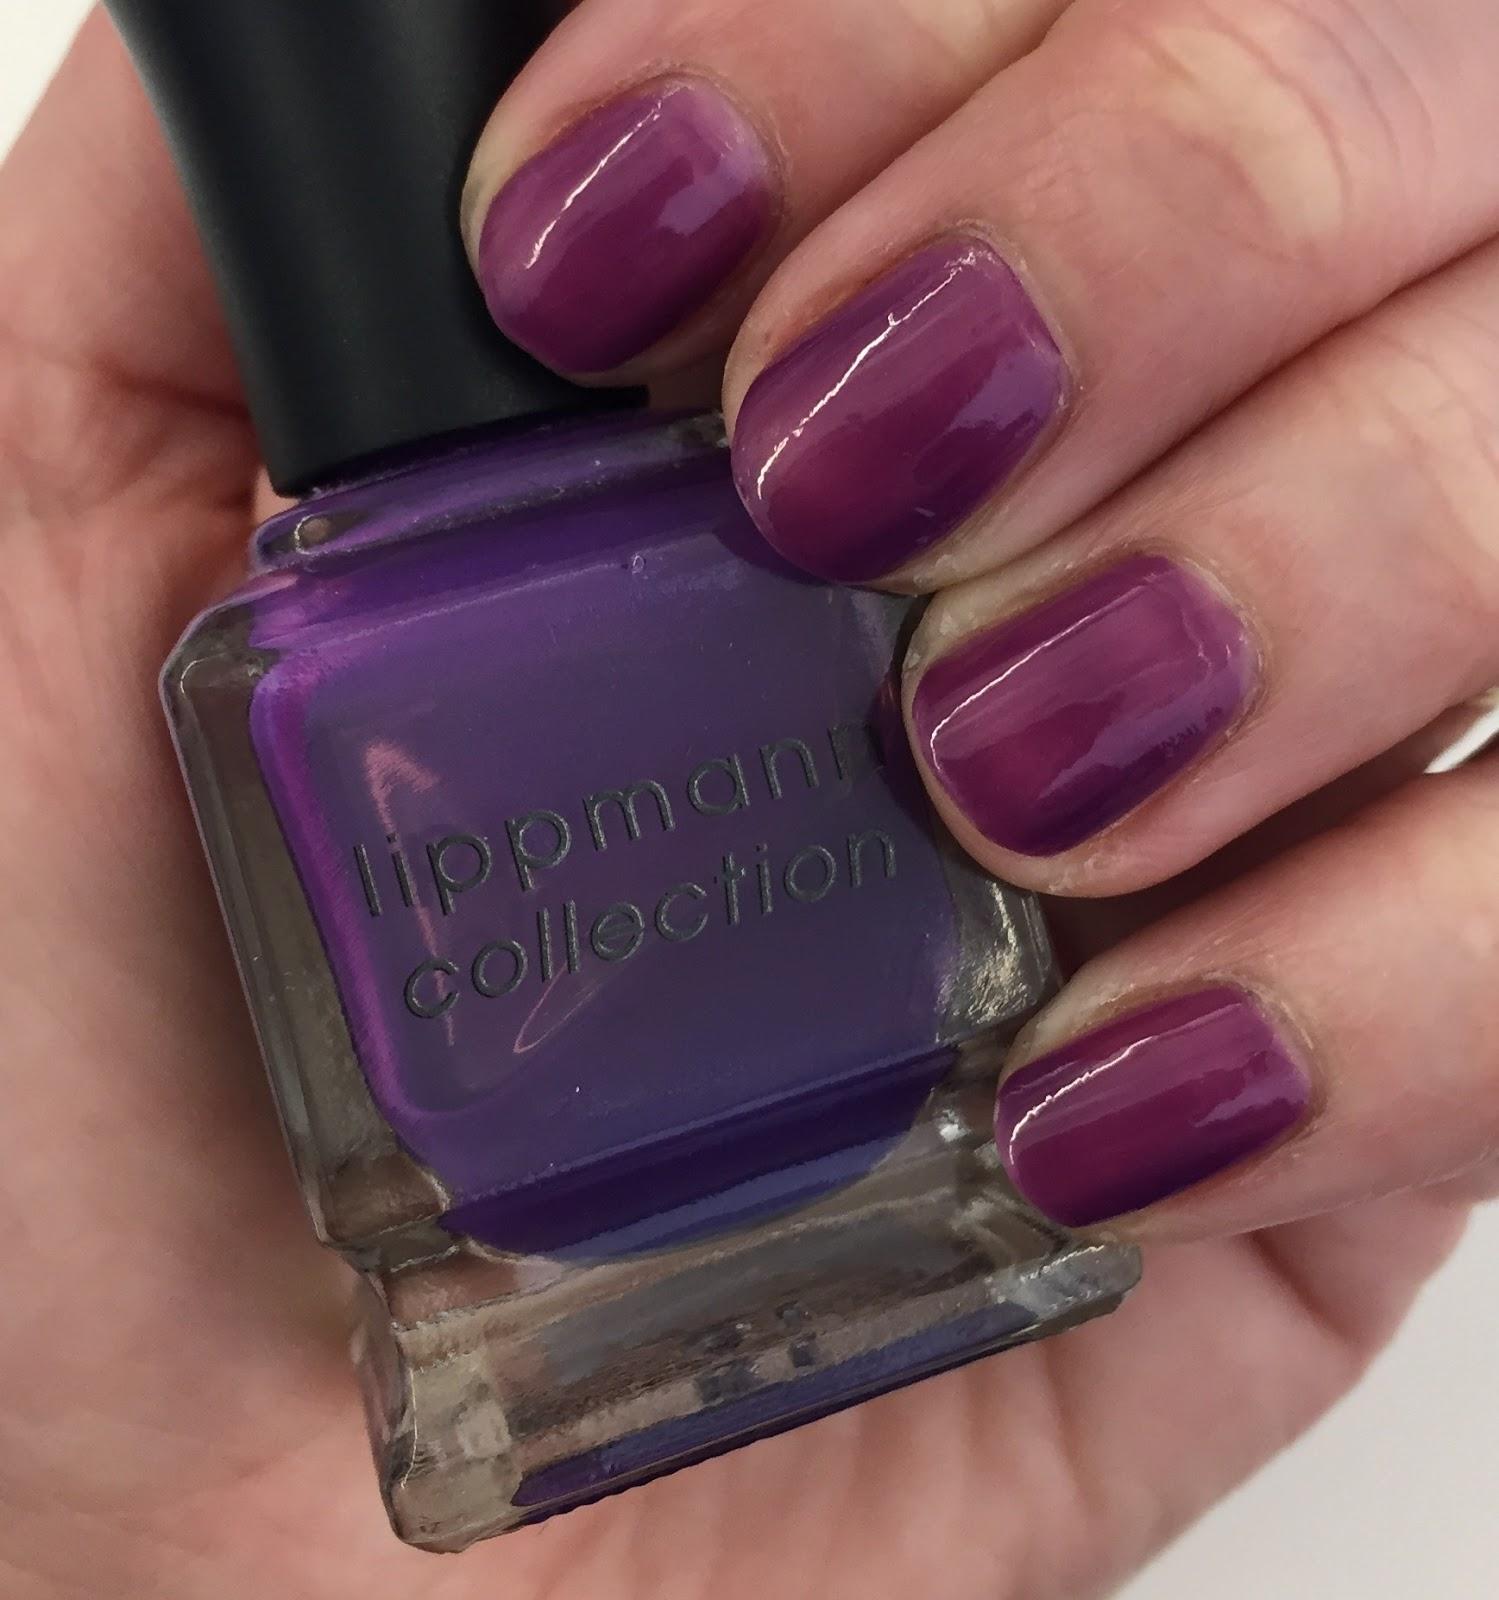 Fashion week Lippmans deborah empire nail polish for woman